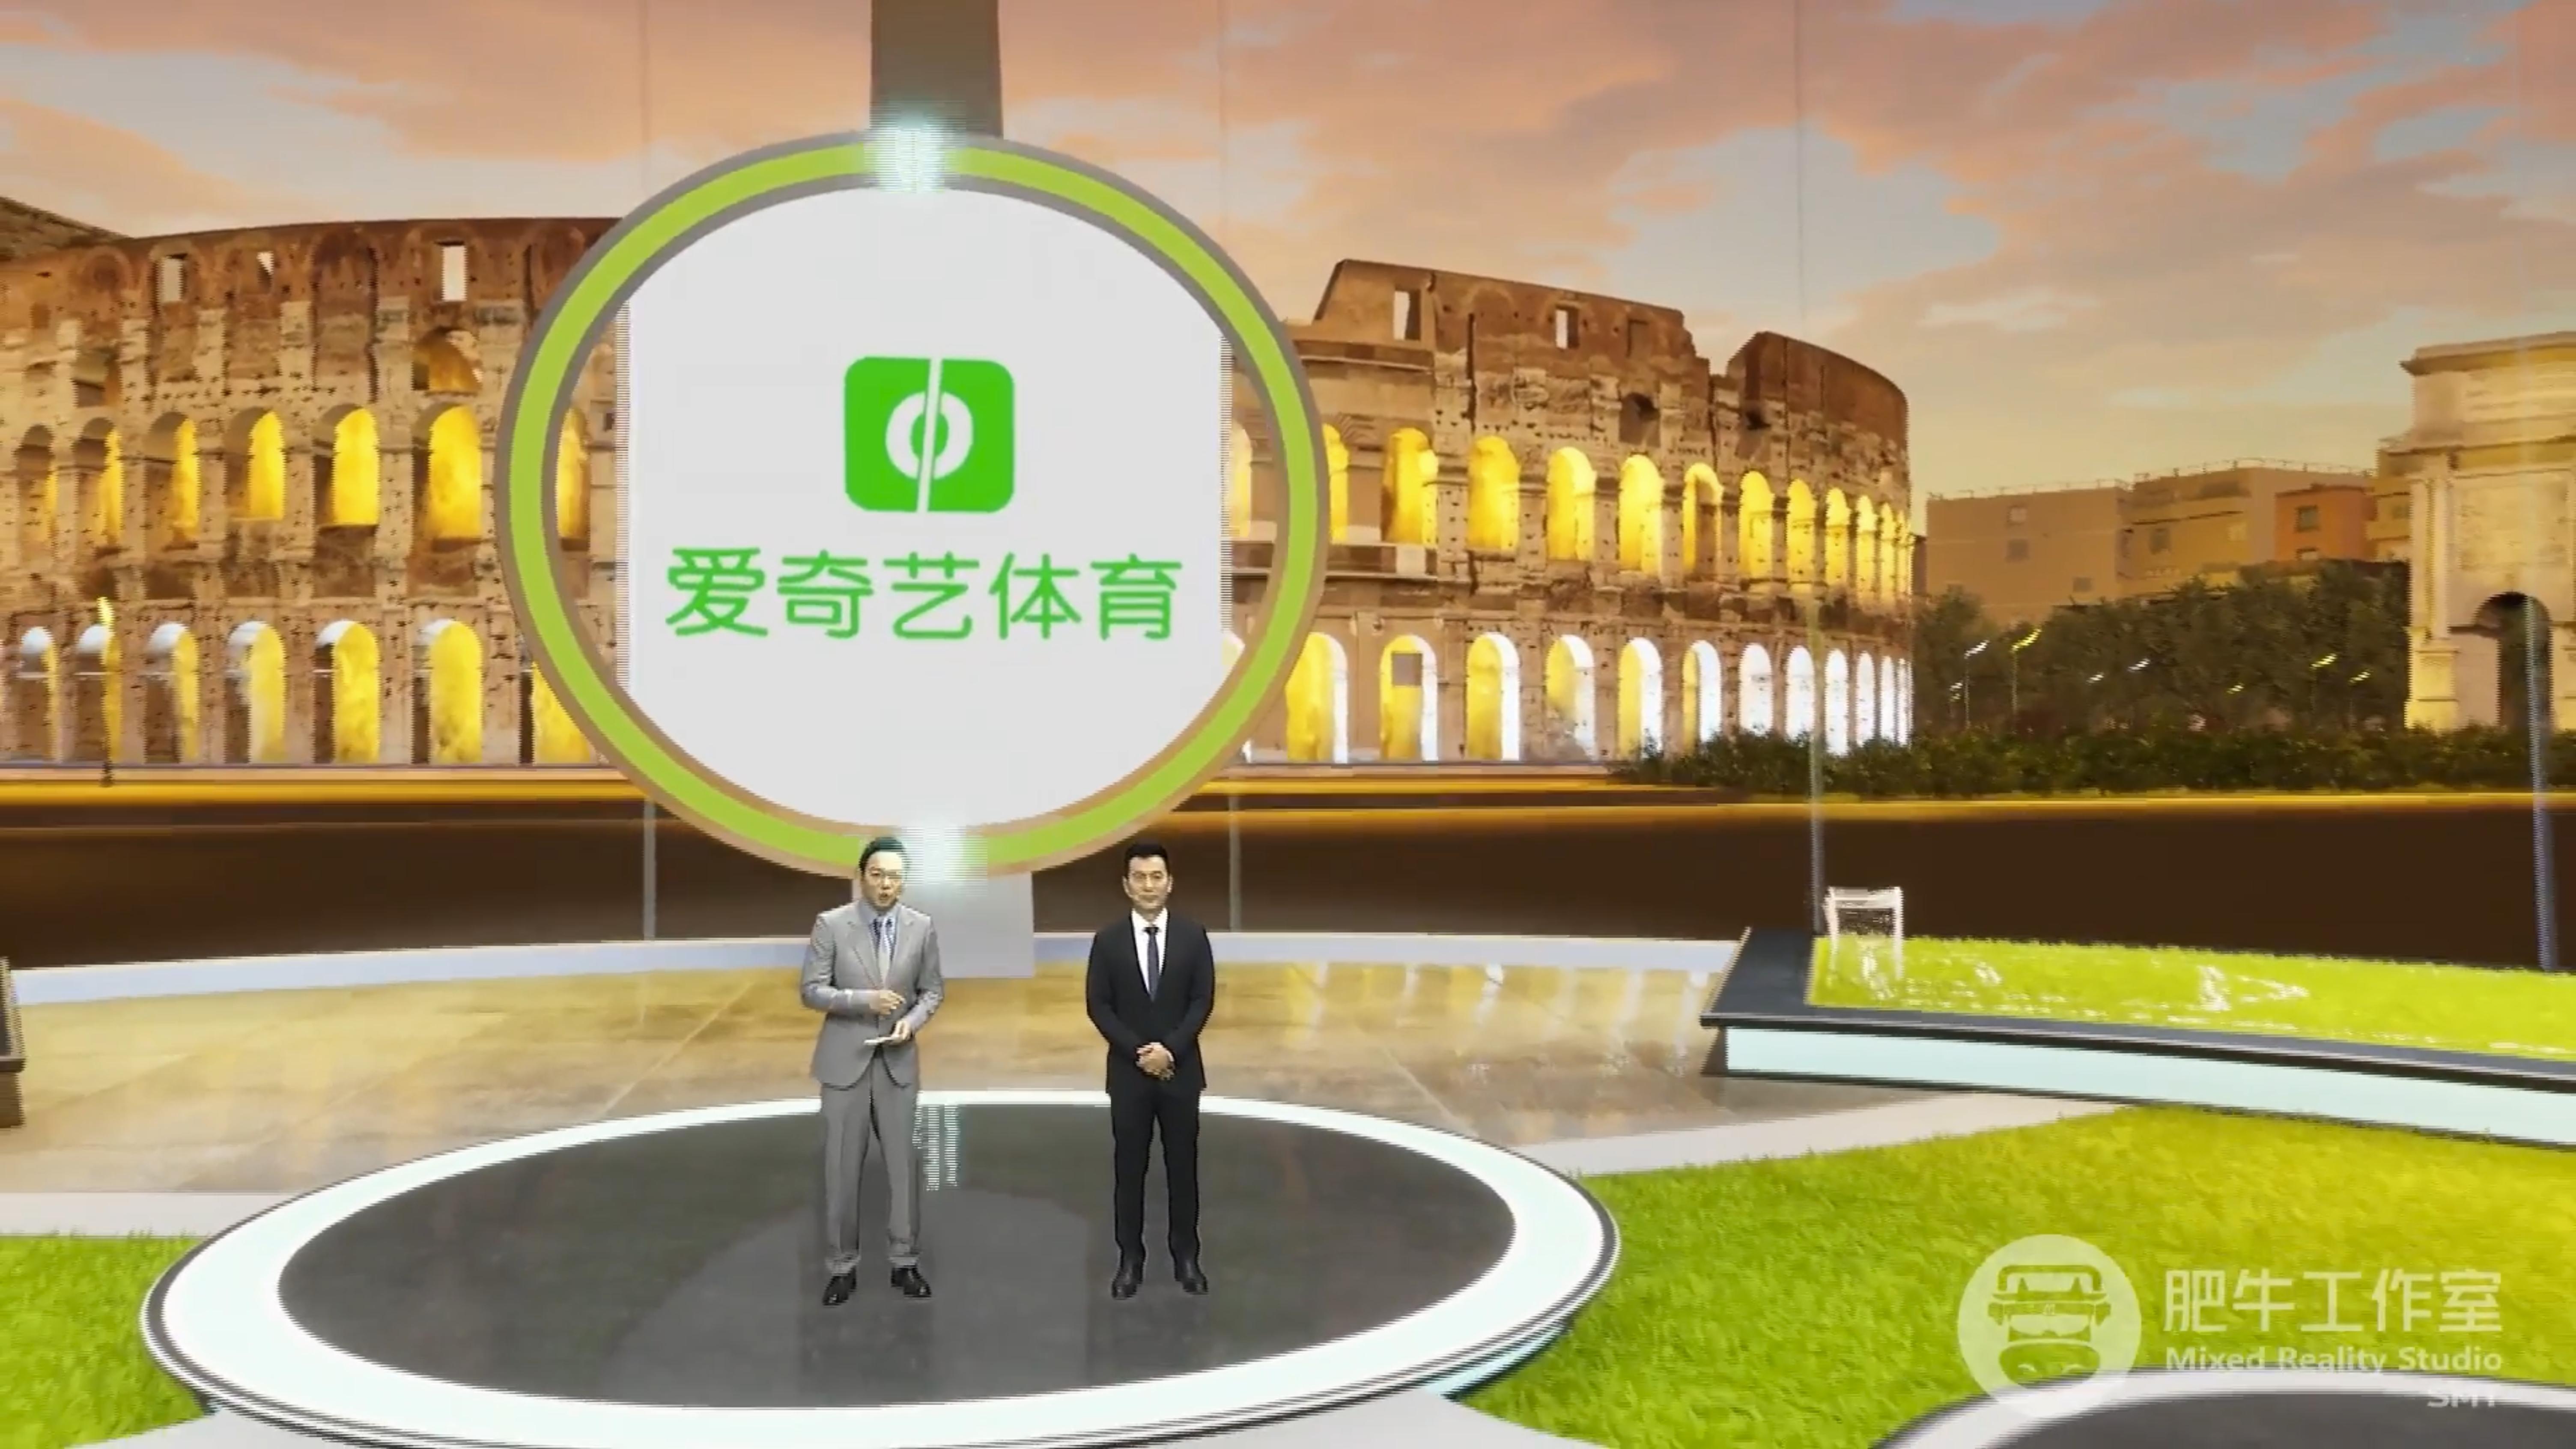 How Shanghai Media Group used Pixotope to create in-studio AR graphics